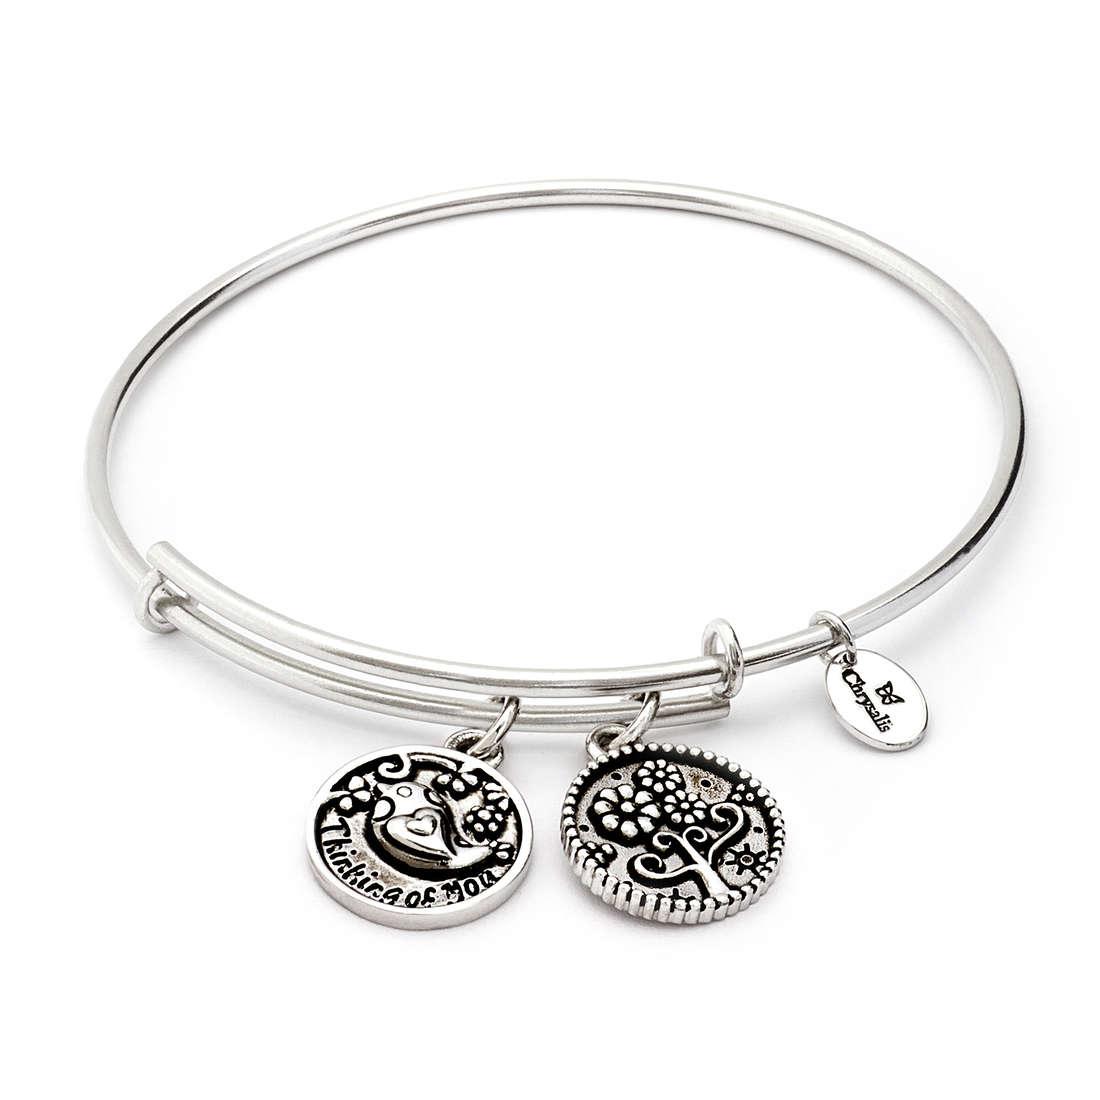 bracelet woman jewellery Chrysalis CRBT0715SP